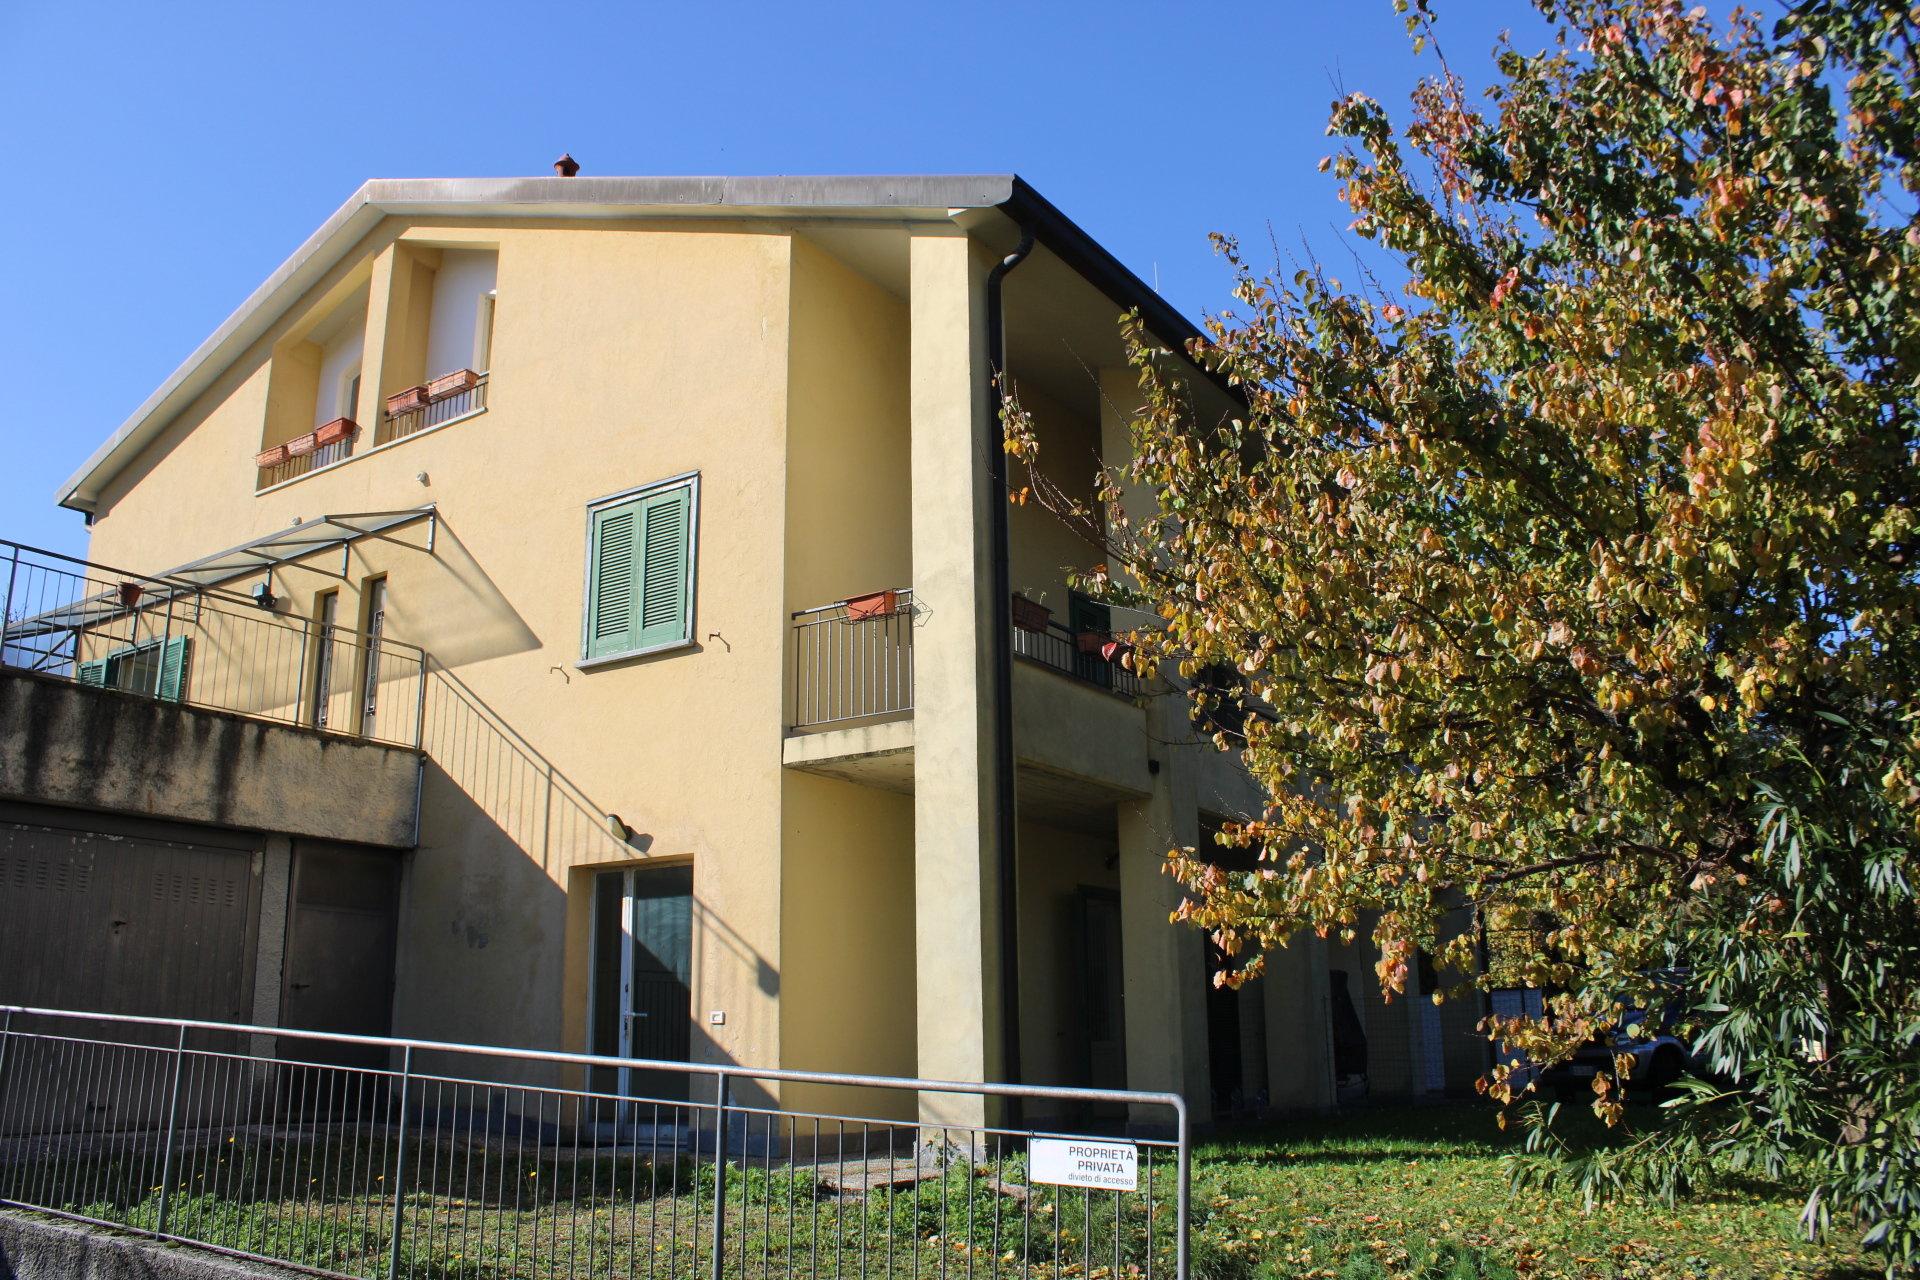 Sale Villa - Tavernerio - Italy